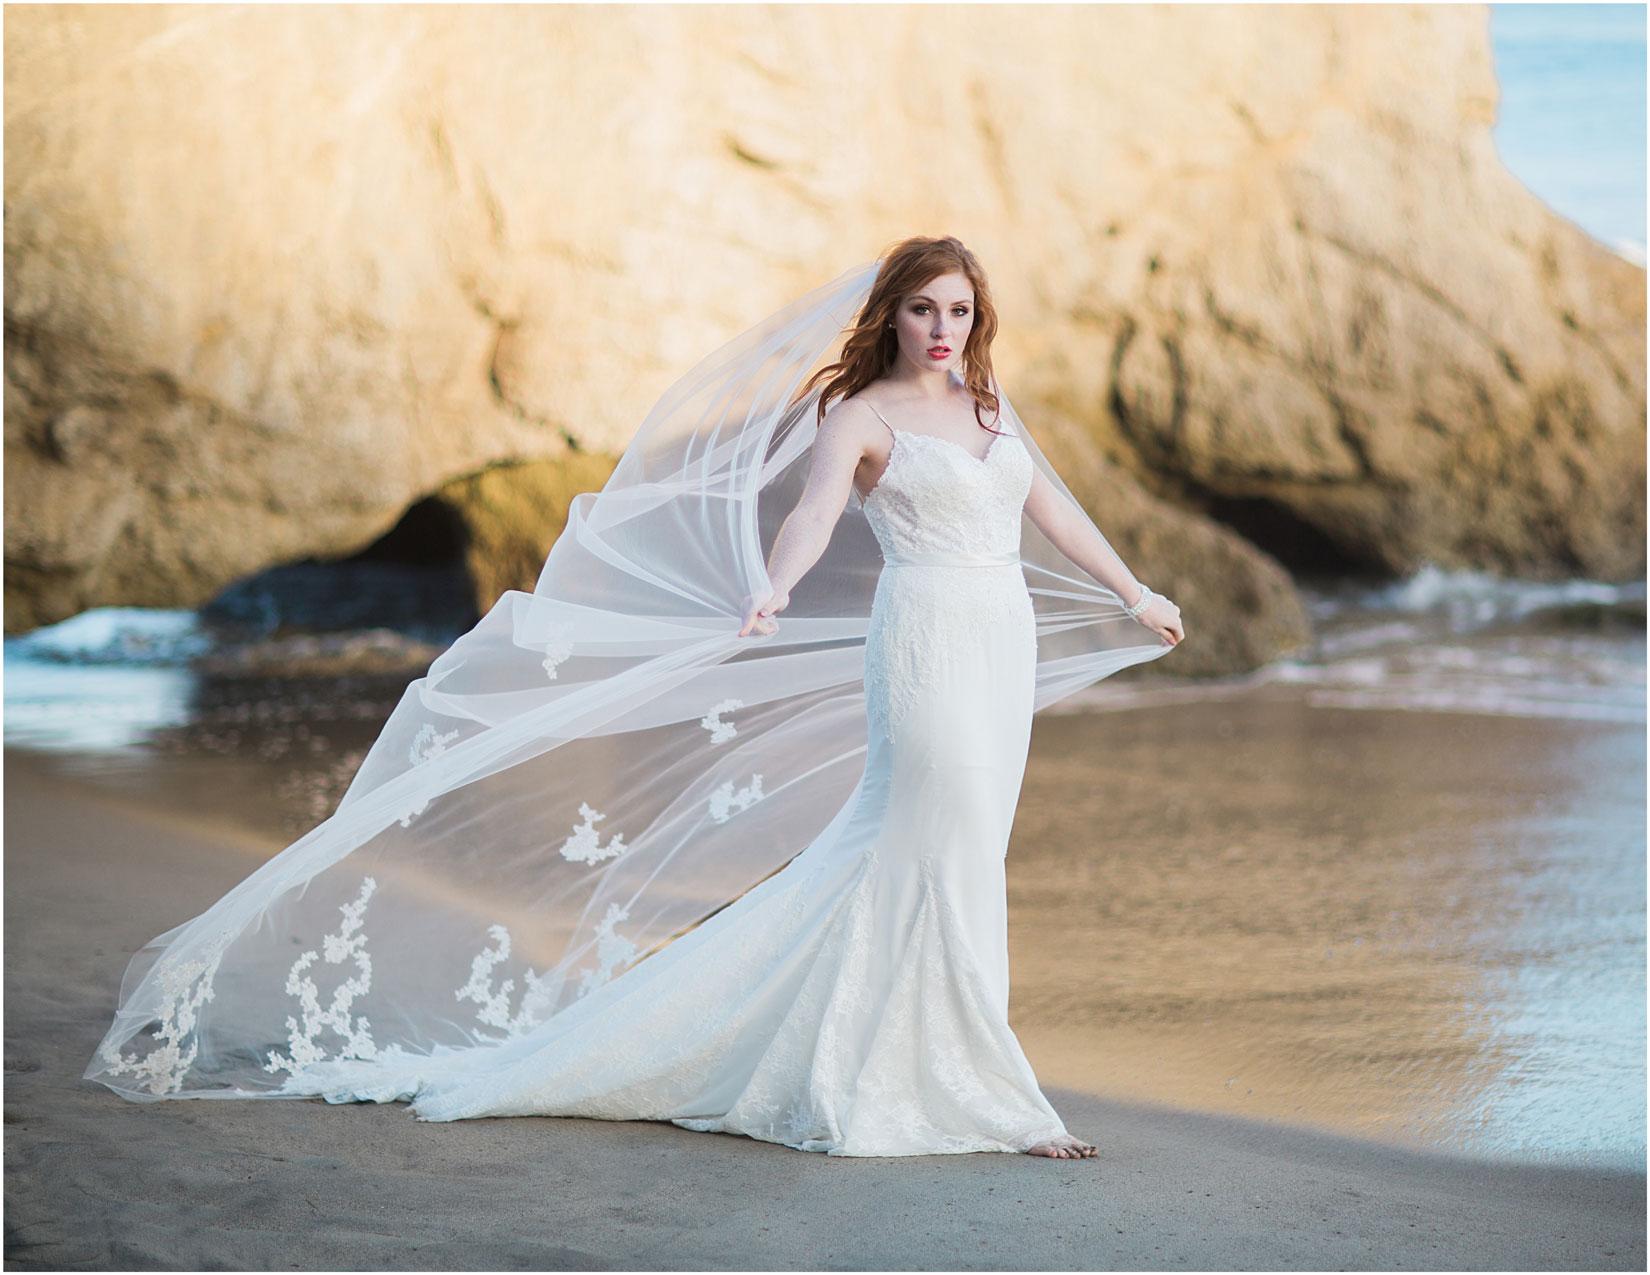 Bel-Aire-Bridal-Jen-Fuj-Photography-V7263C